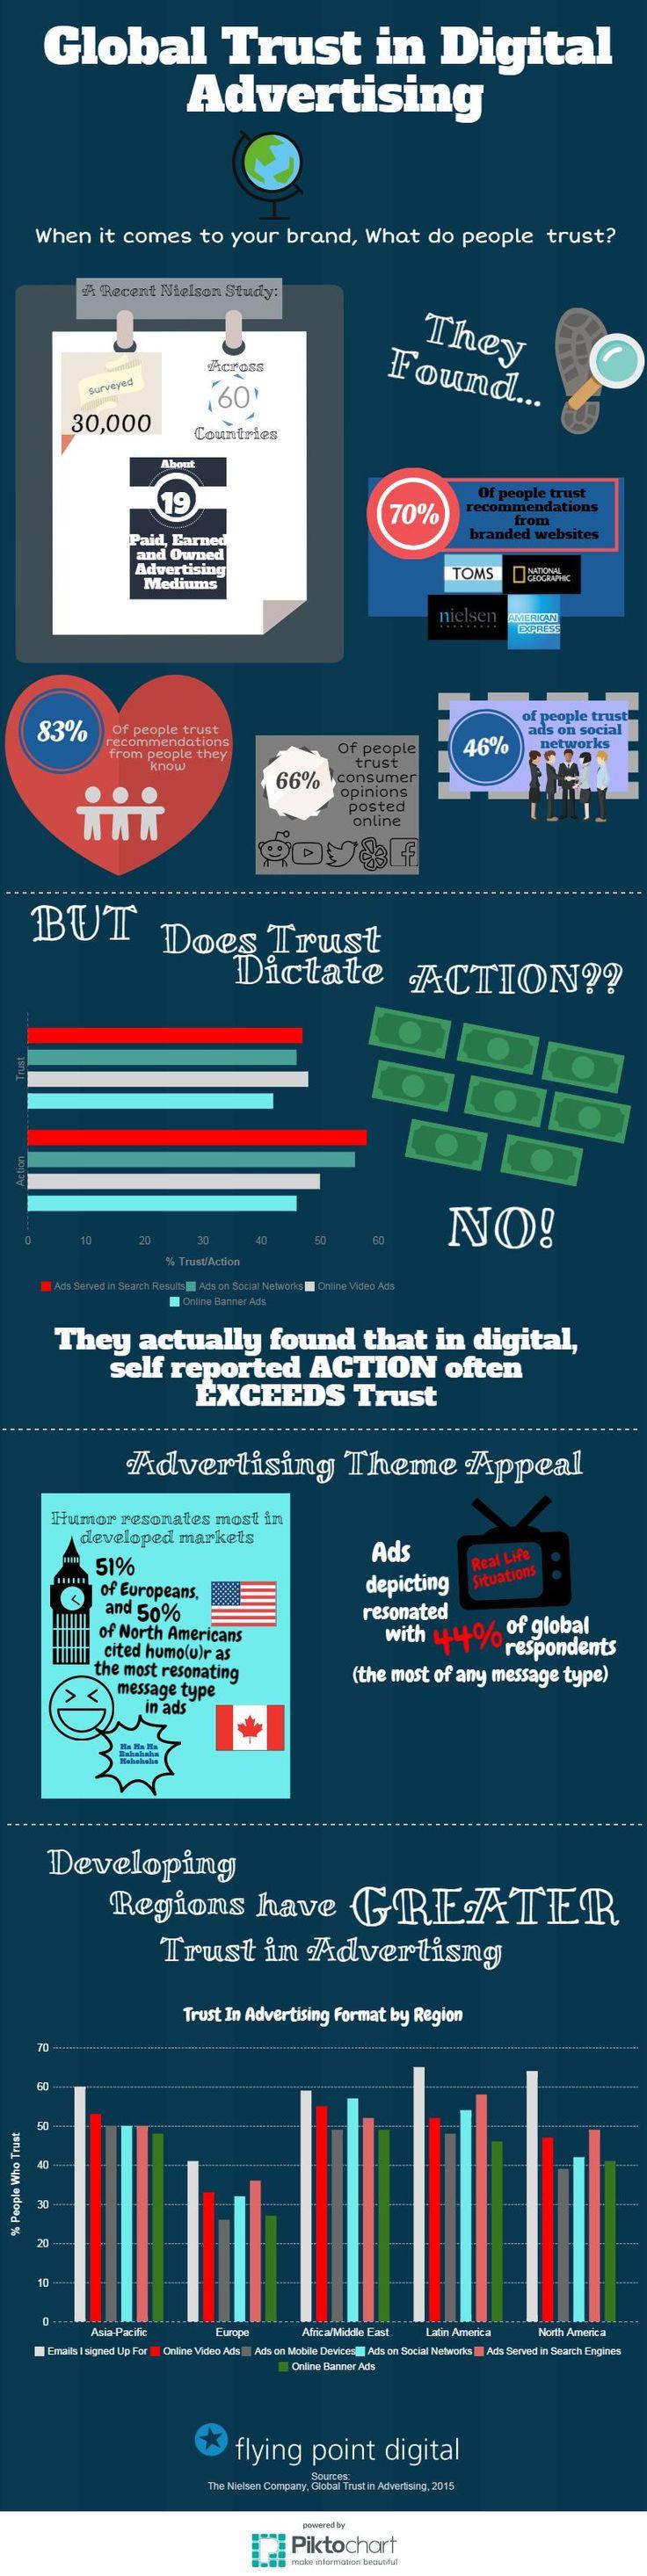 DIGITAL ADVERTISING STRATEGIES: 2015 GLOBAL INSIGHTS #infographic #Brands #Advertising